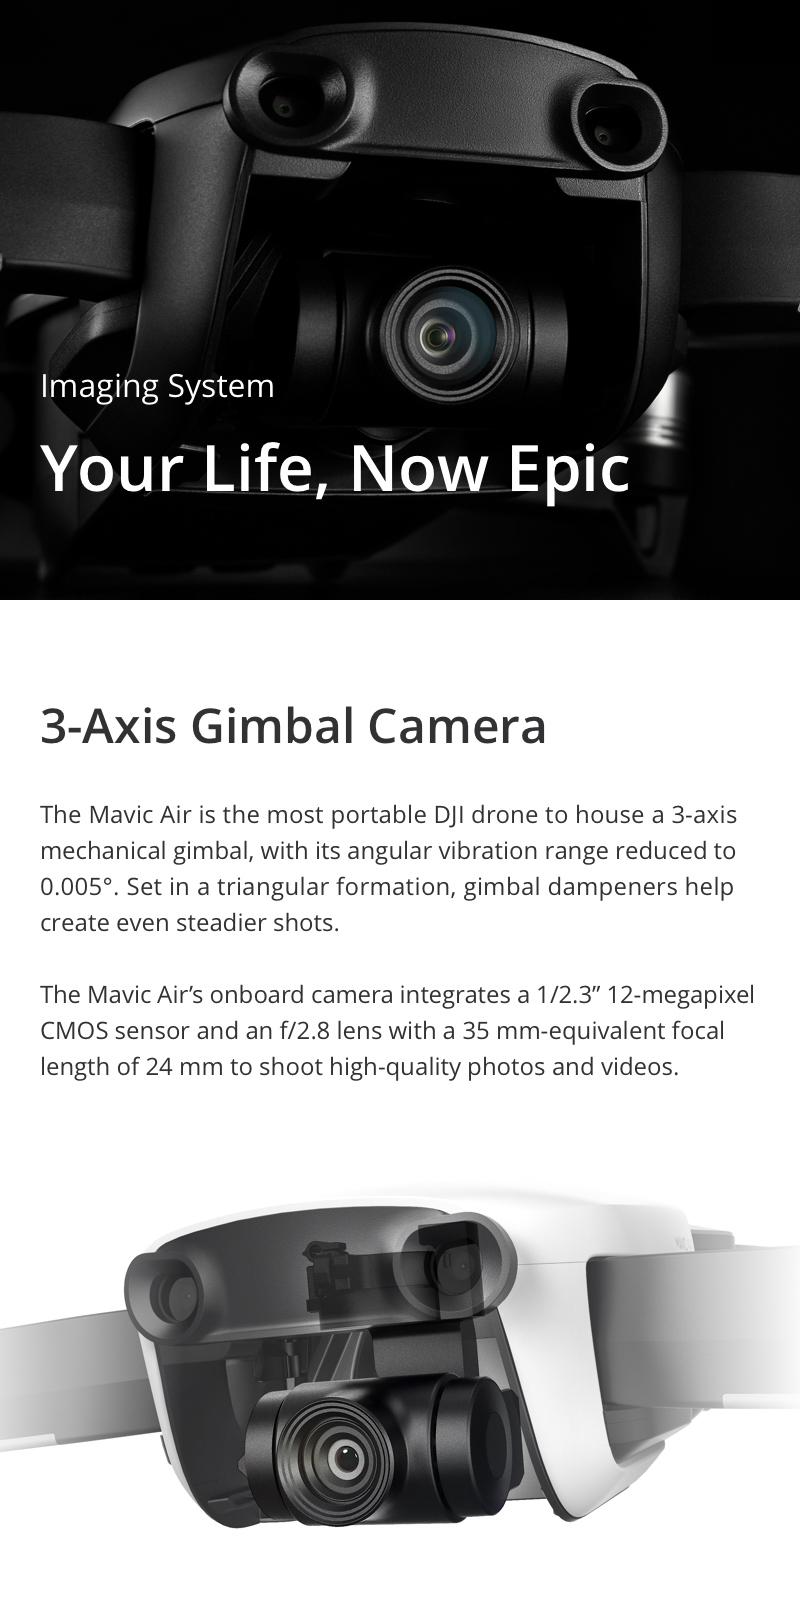 DJI Mavic Air 4KM FPV w/ 3-Axis Gimbal 4K Camera 32MP Sphere Panoramas RC Drone Quadcopter - Photo: 2